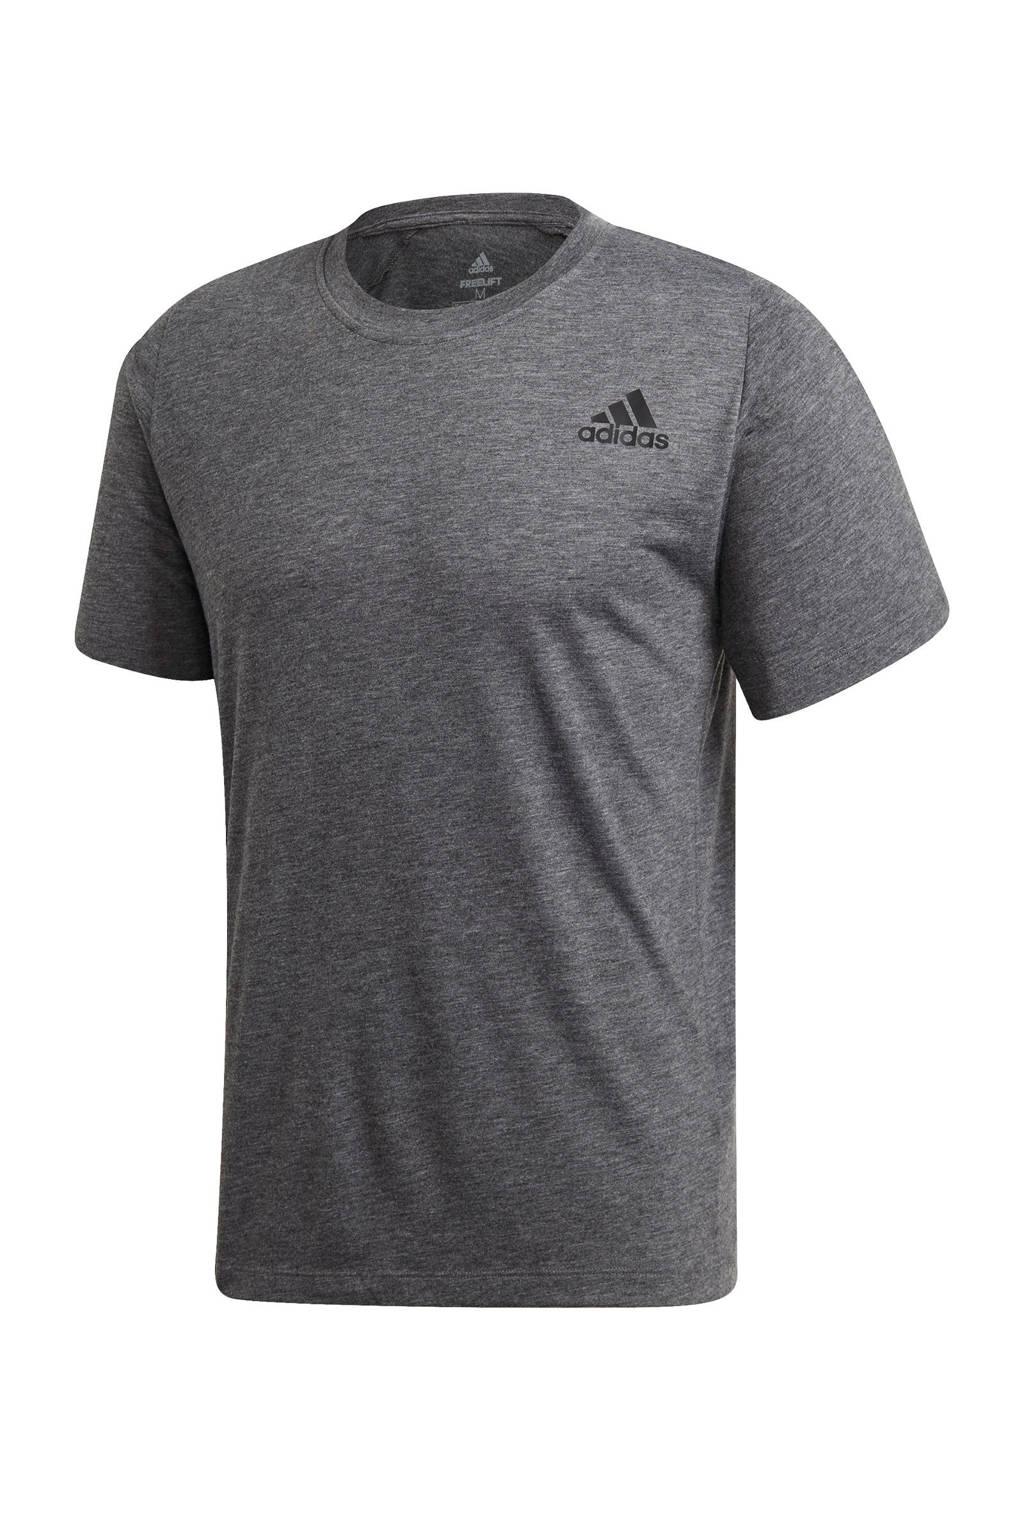 adidas   sport T-shirt antraciet, Antraciet